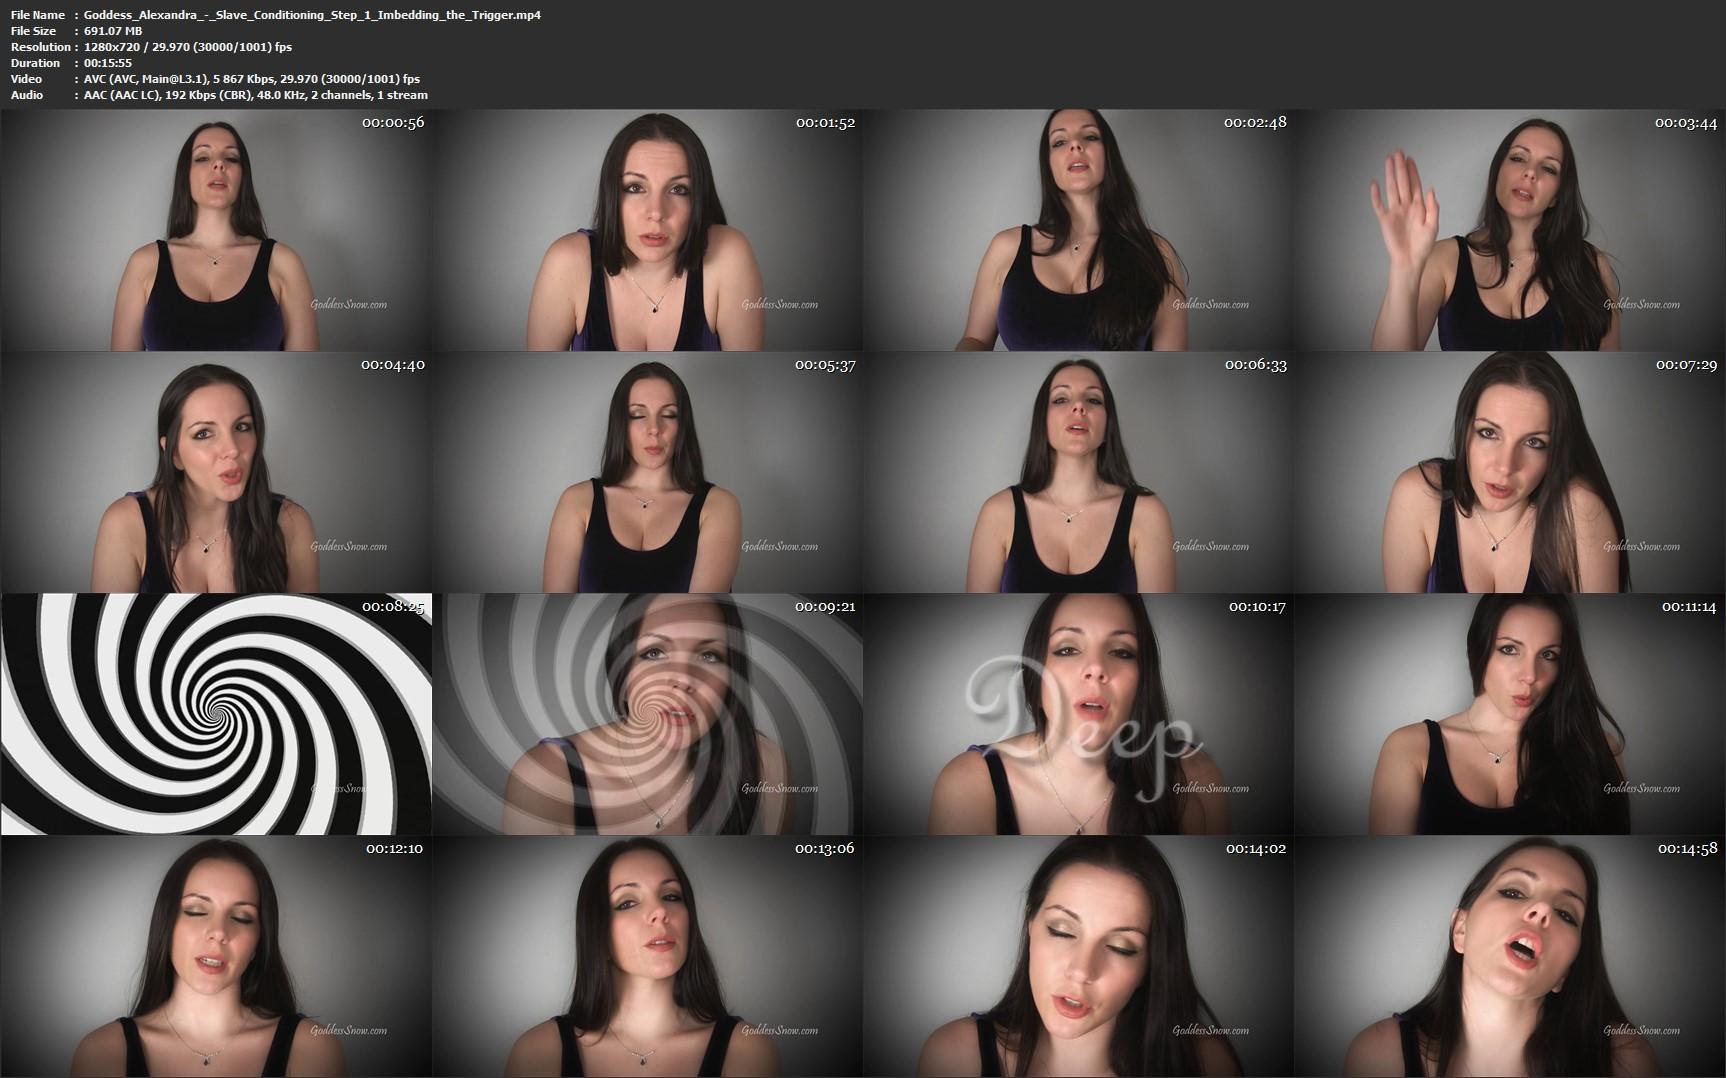 Goddess Alexandra Show - Slave Conditioning Step 1 Imbedding the Trigger